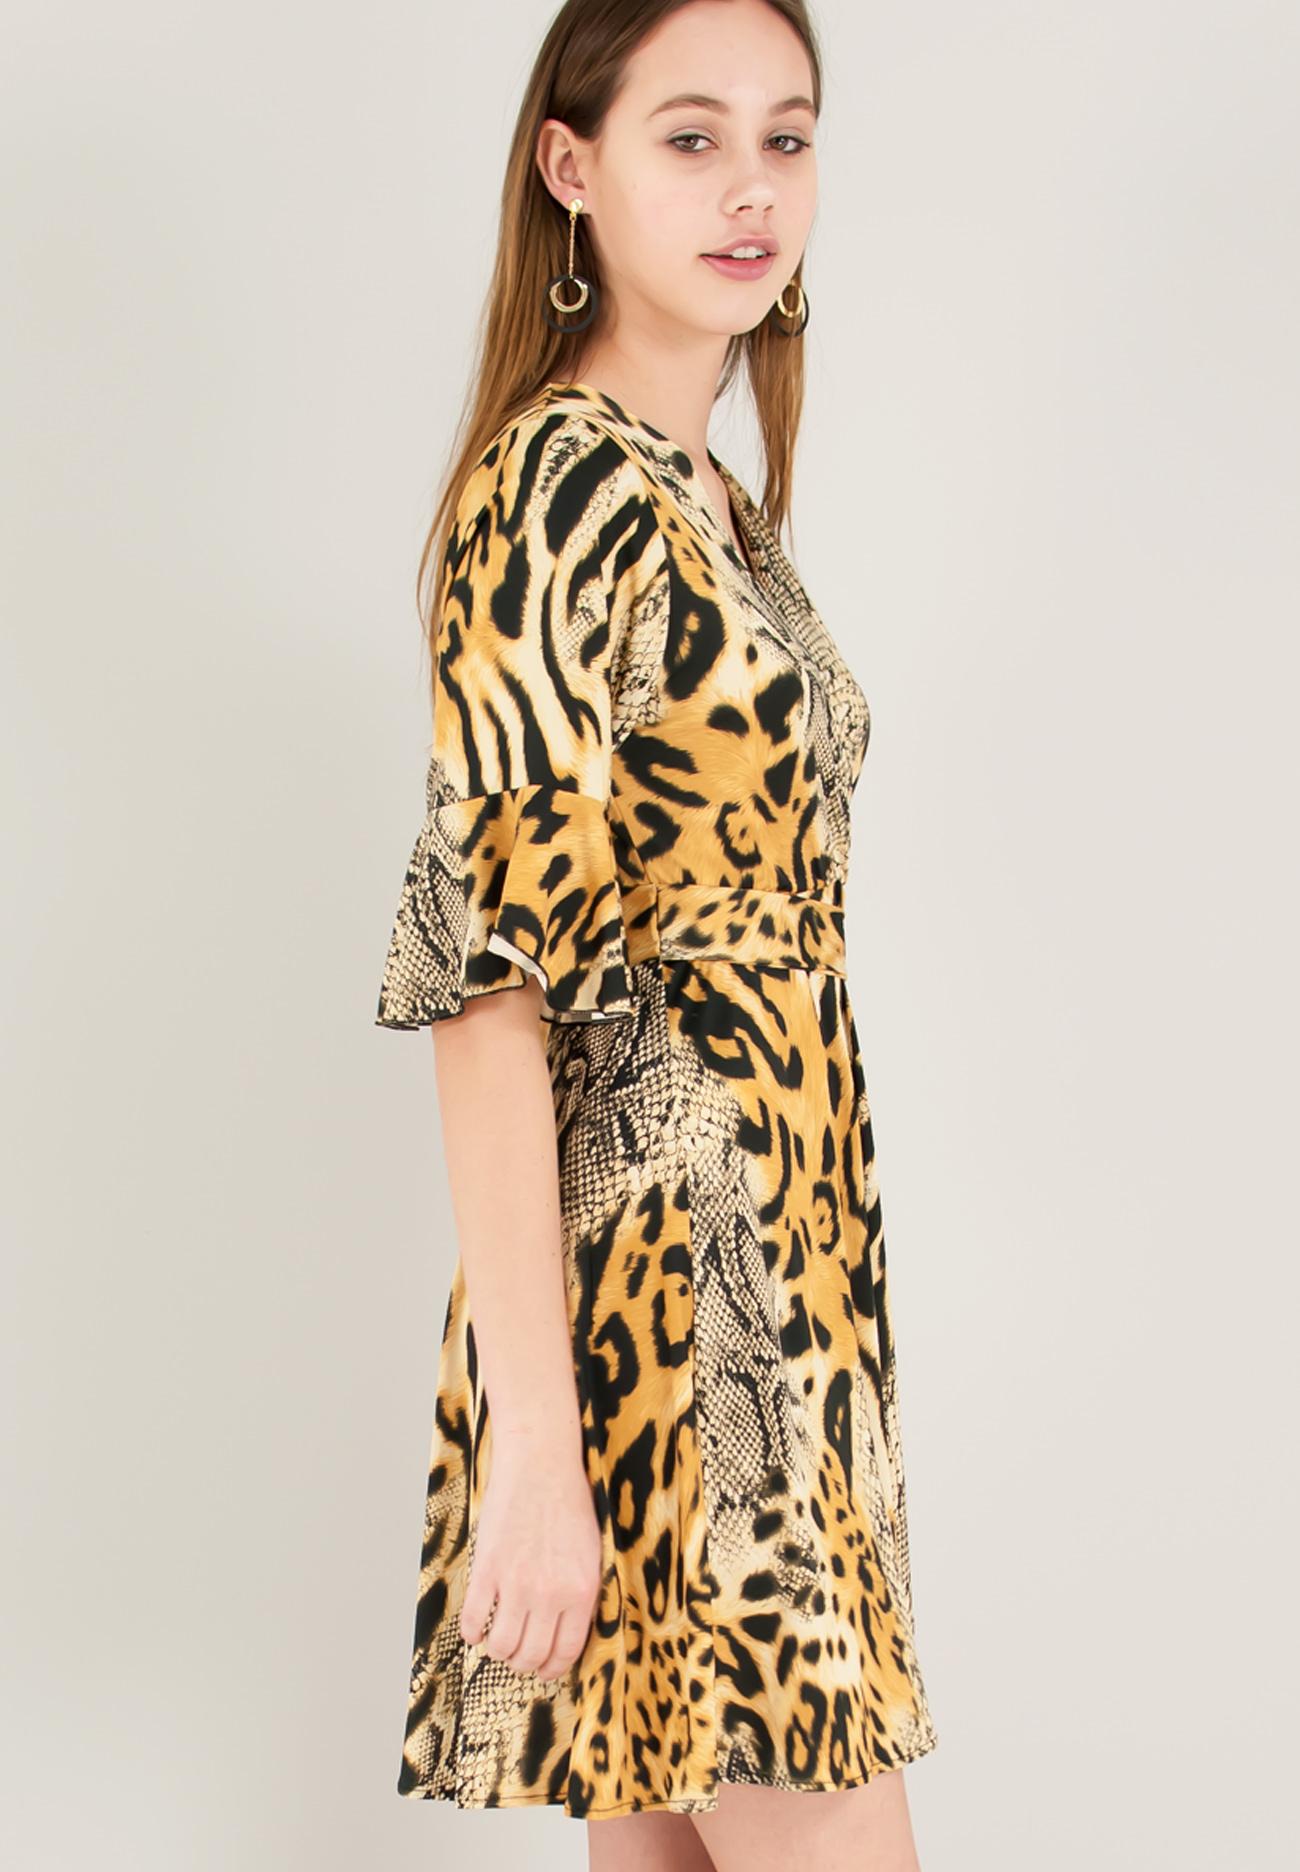 75aaa4cd9b74 Animal print κρουαζέ φόρεμα - ZIC ZAC